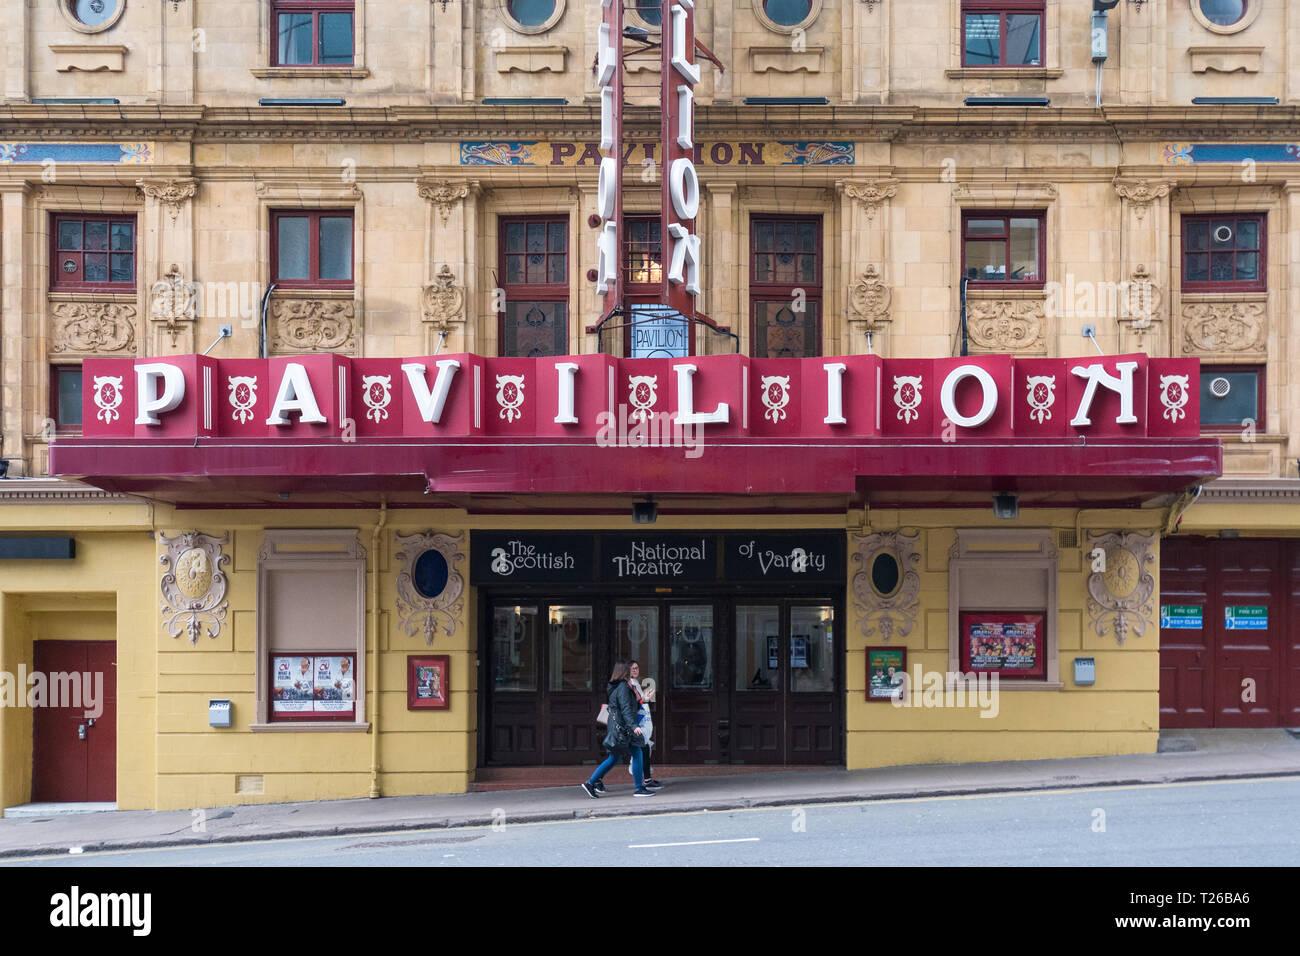 Pavilion Theatre - The Scottish National Theatre of Variety - Glasgow, Scotland, UK - Stock Image